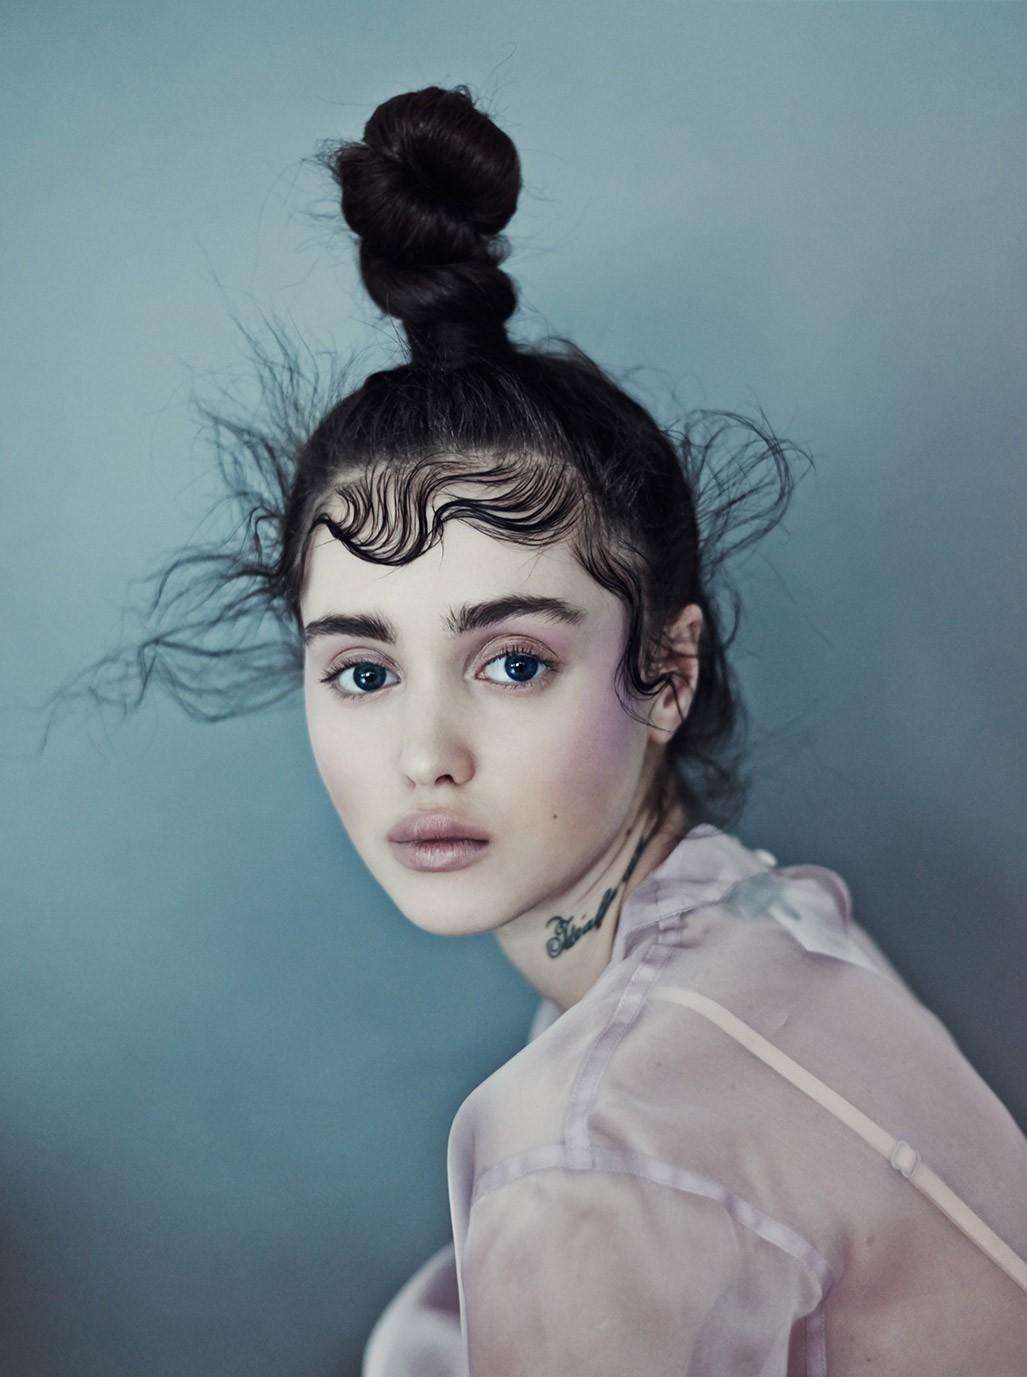 Алия Галяутдинова / Aliya Galyautdinova by Nicolas Guerin - Schon! Magazine